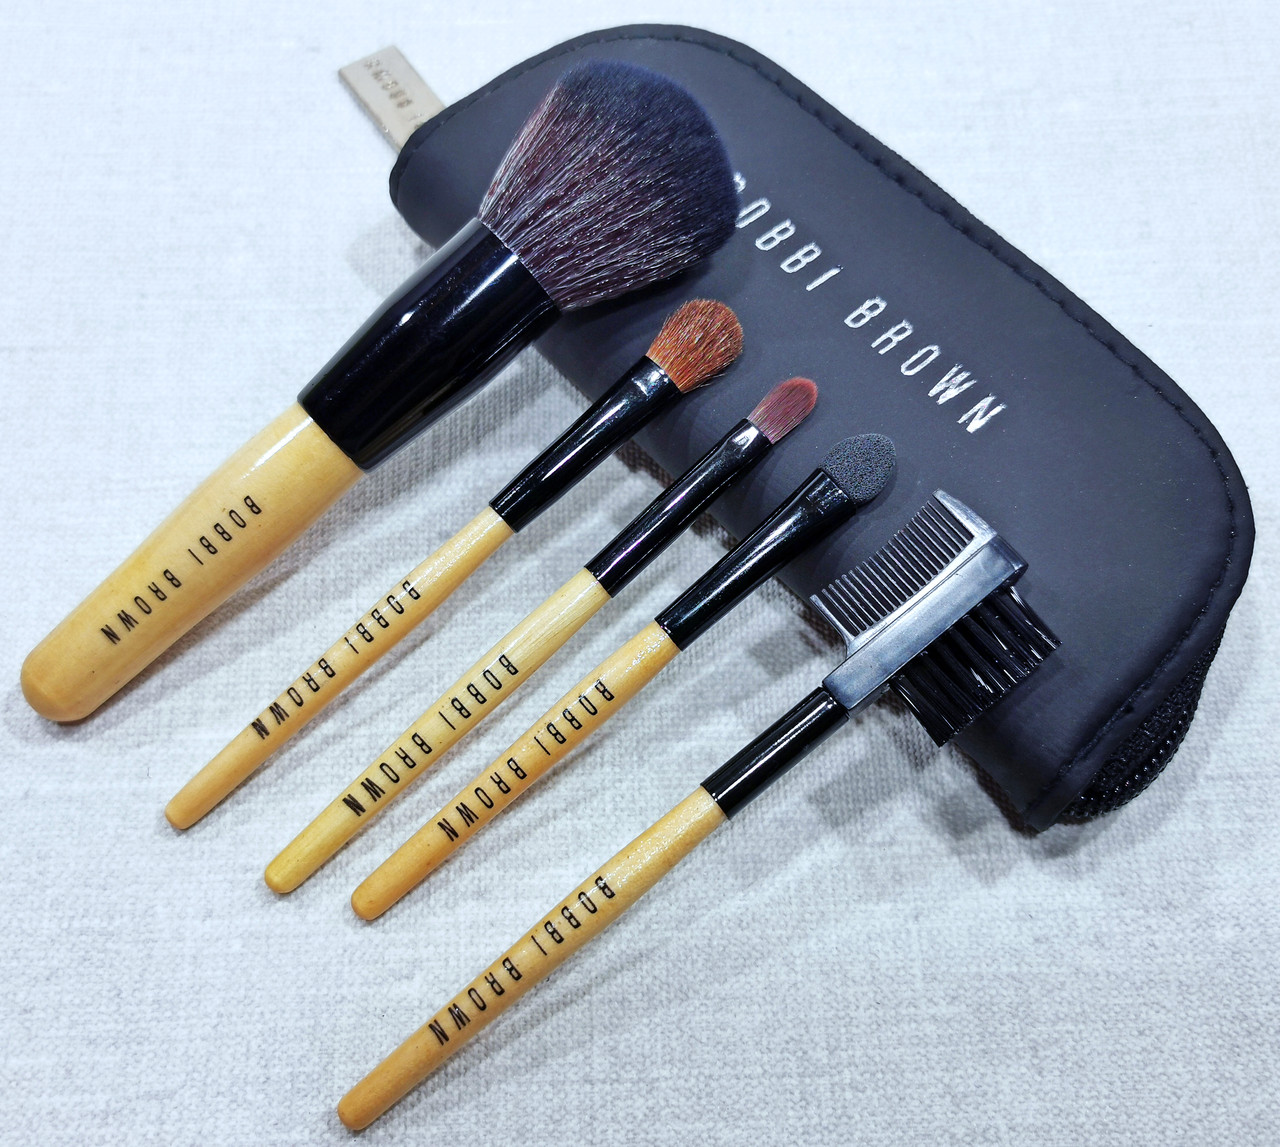 Набор кистей для макияжа Bobbi Brown 5 / Кисти Бобби Браун 5 в кошельке